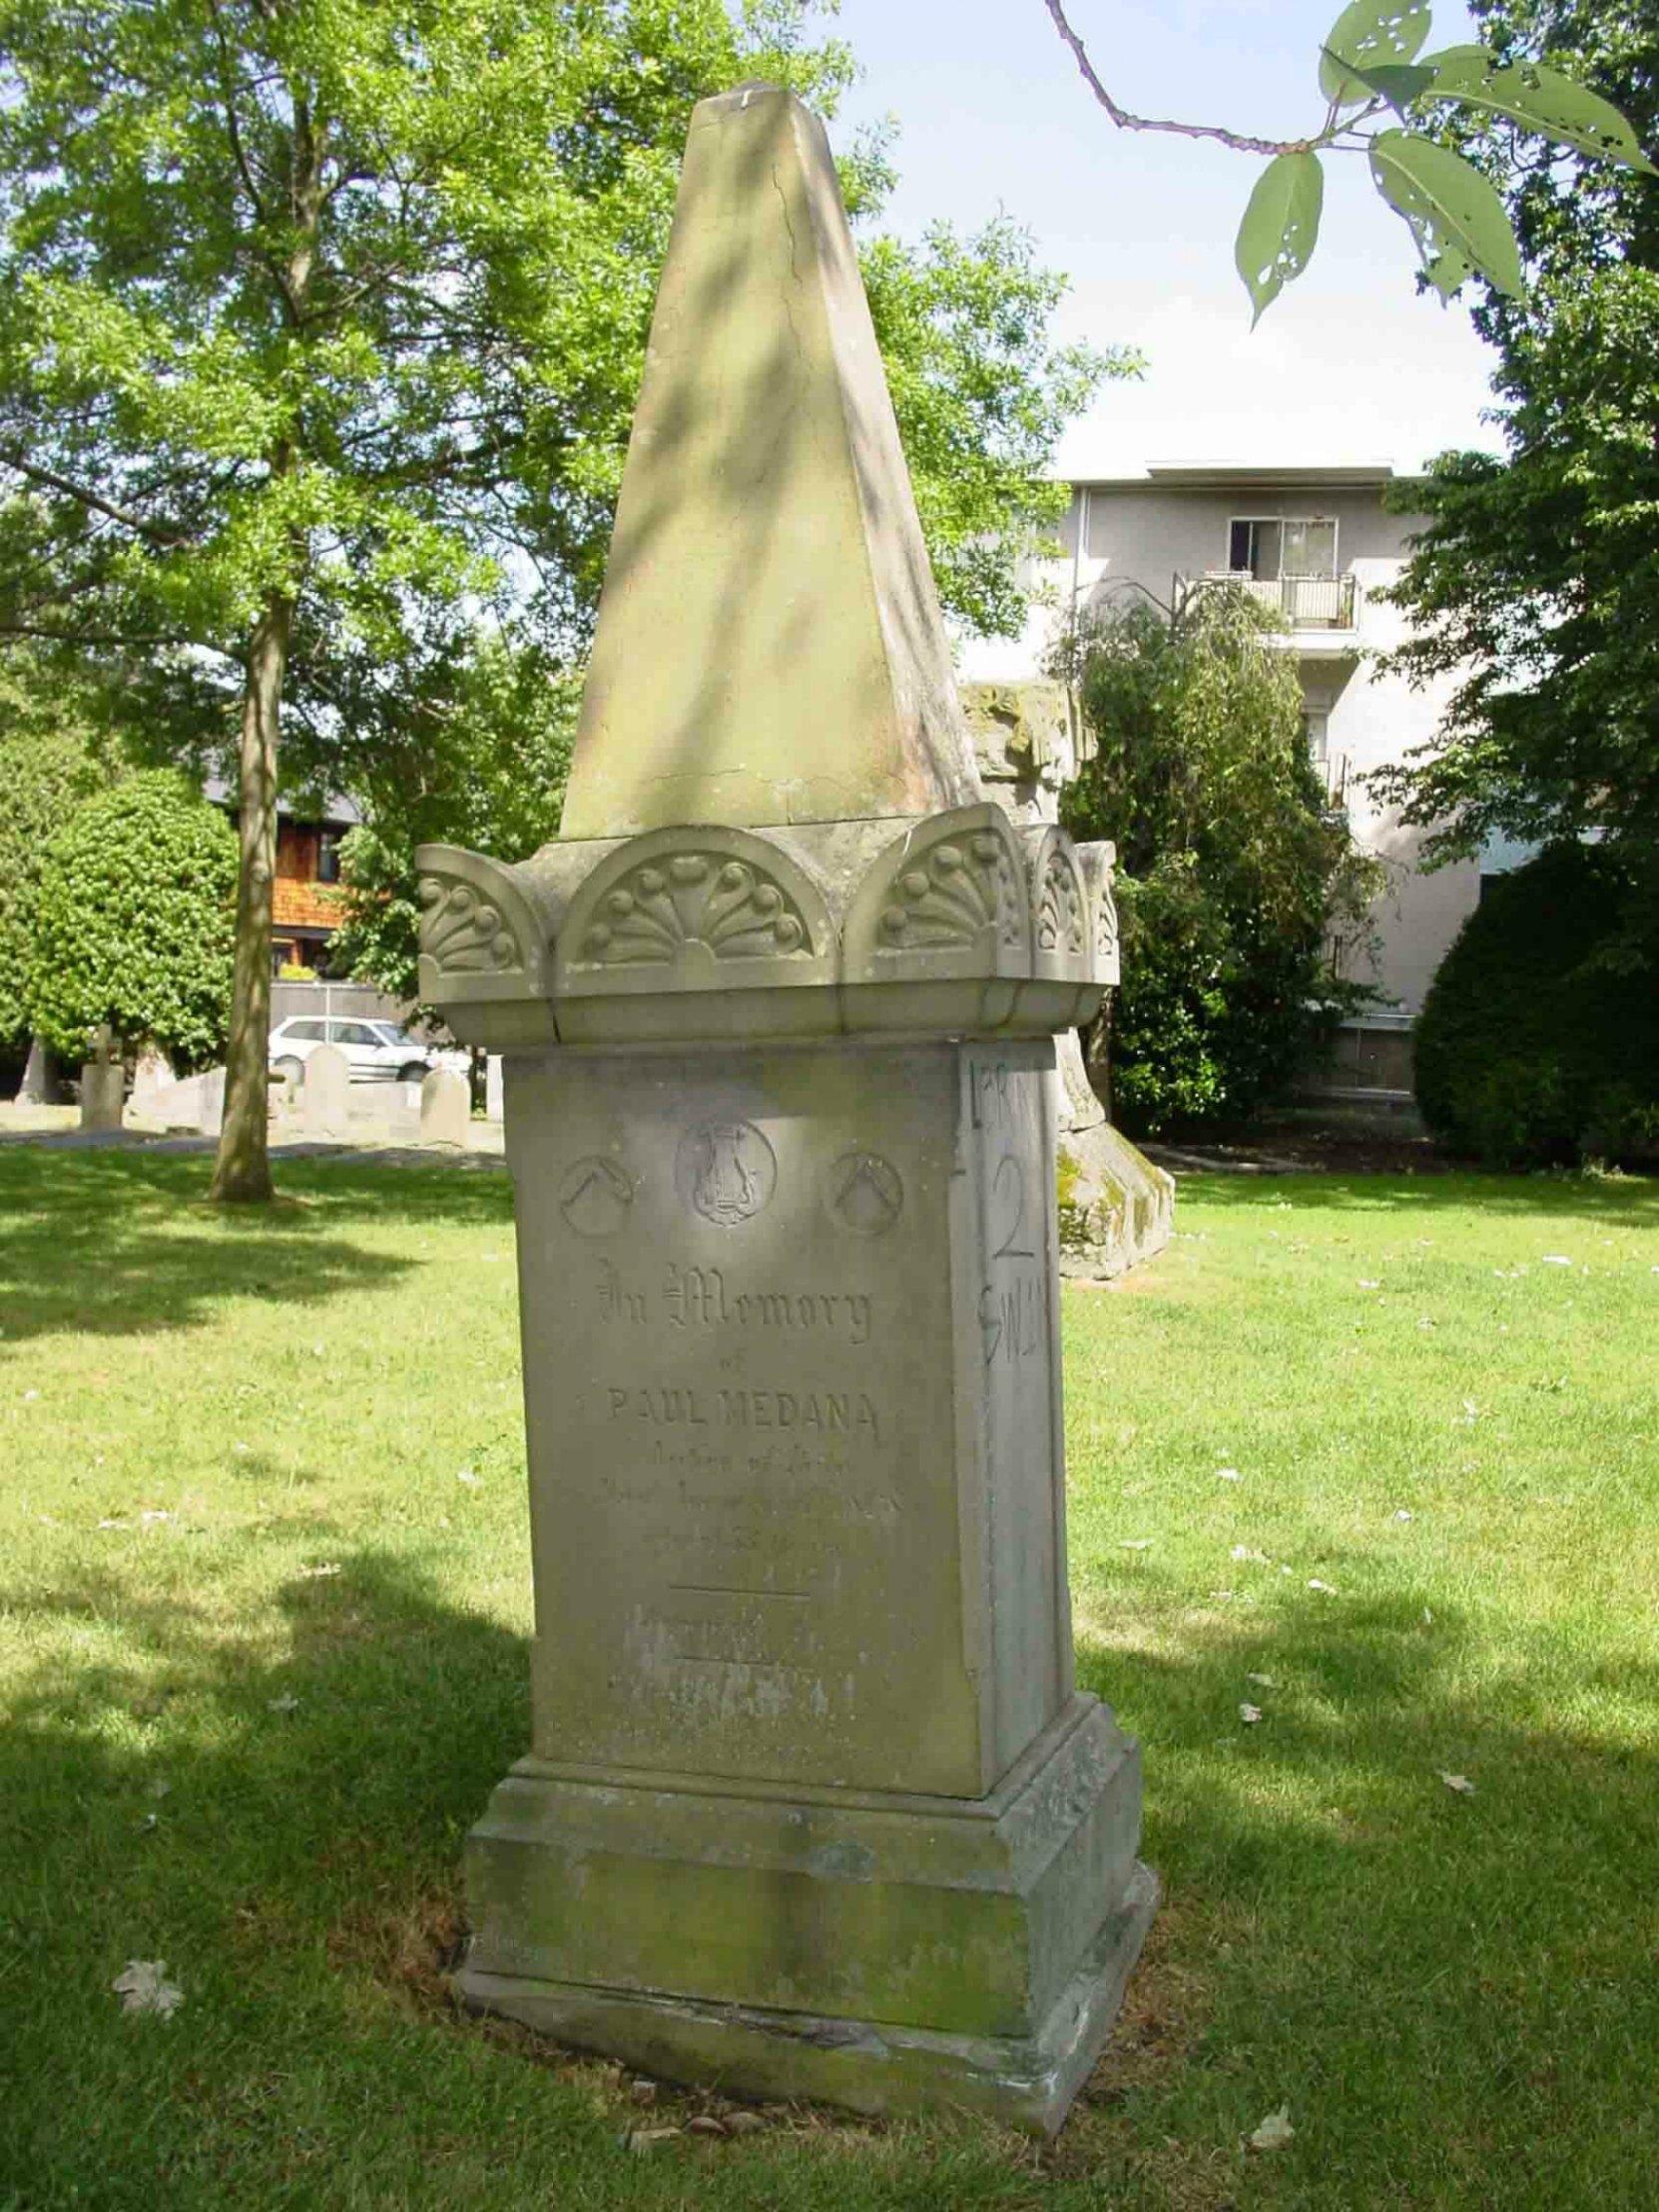 Paul Medana grave marker, Pioneer Square, Victoria, B.C.